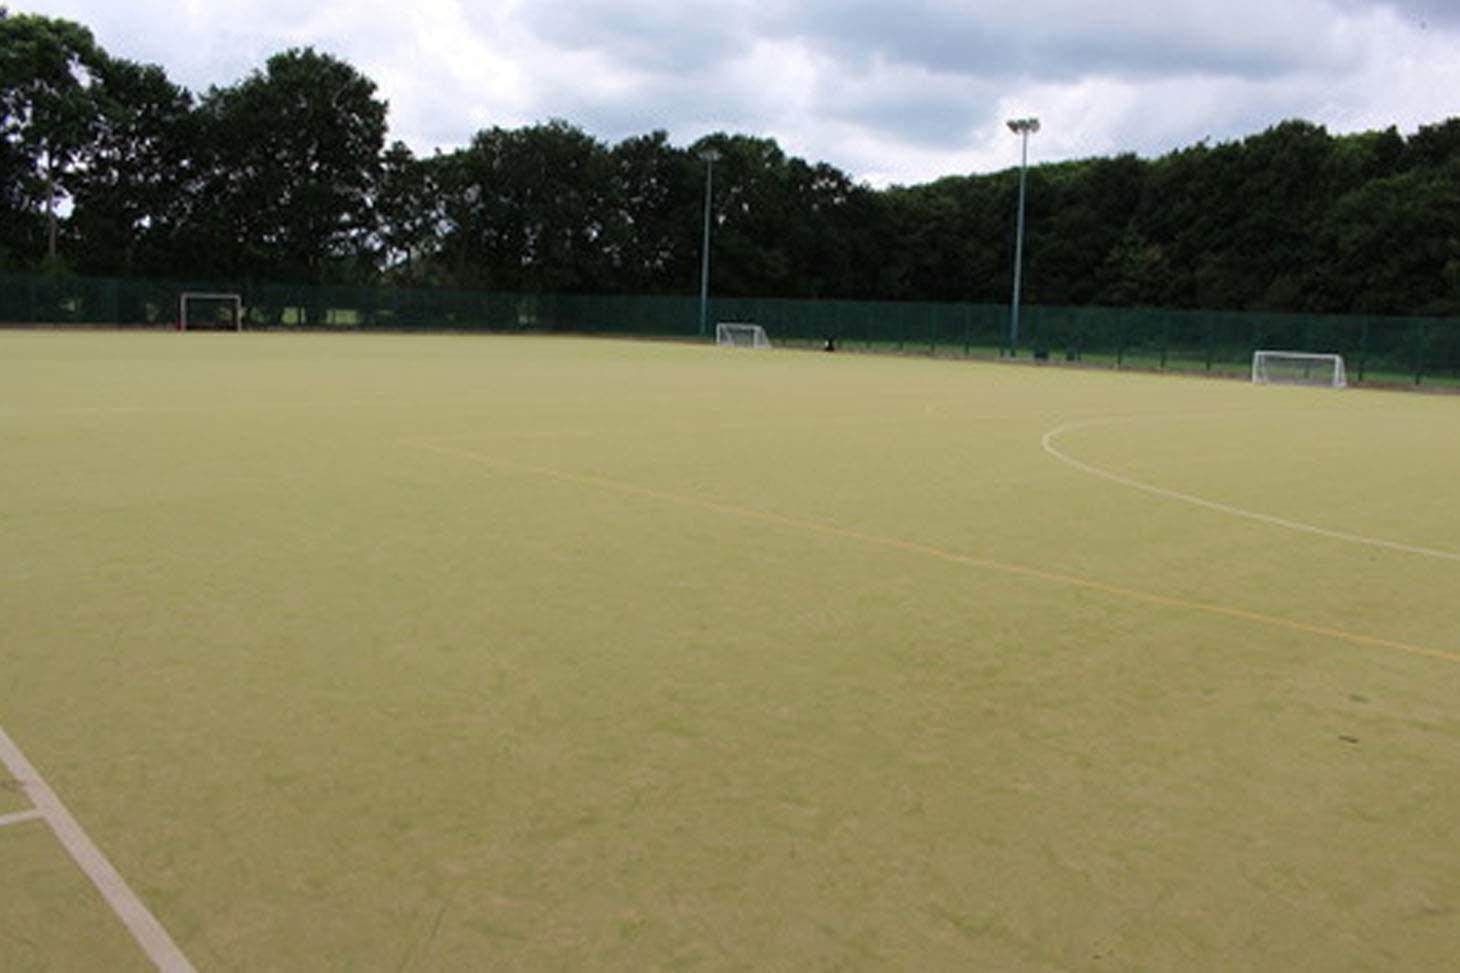 Light Hall School Outdoor   Astroturf hockey pitch